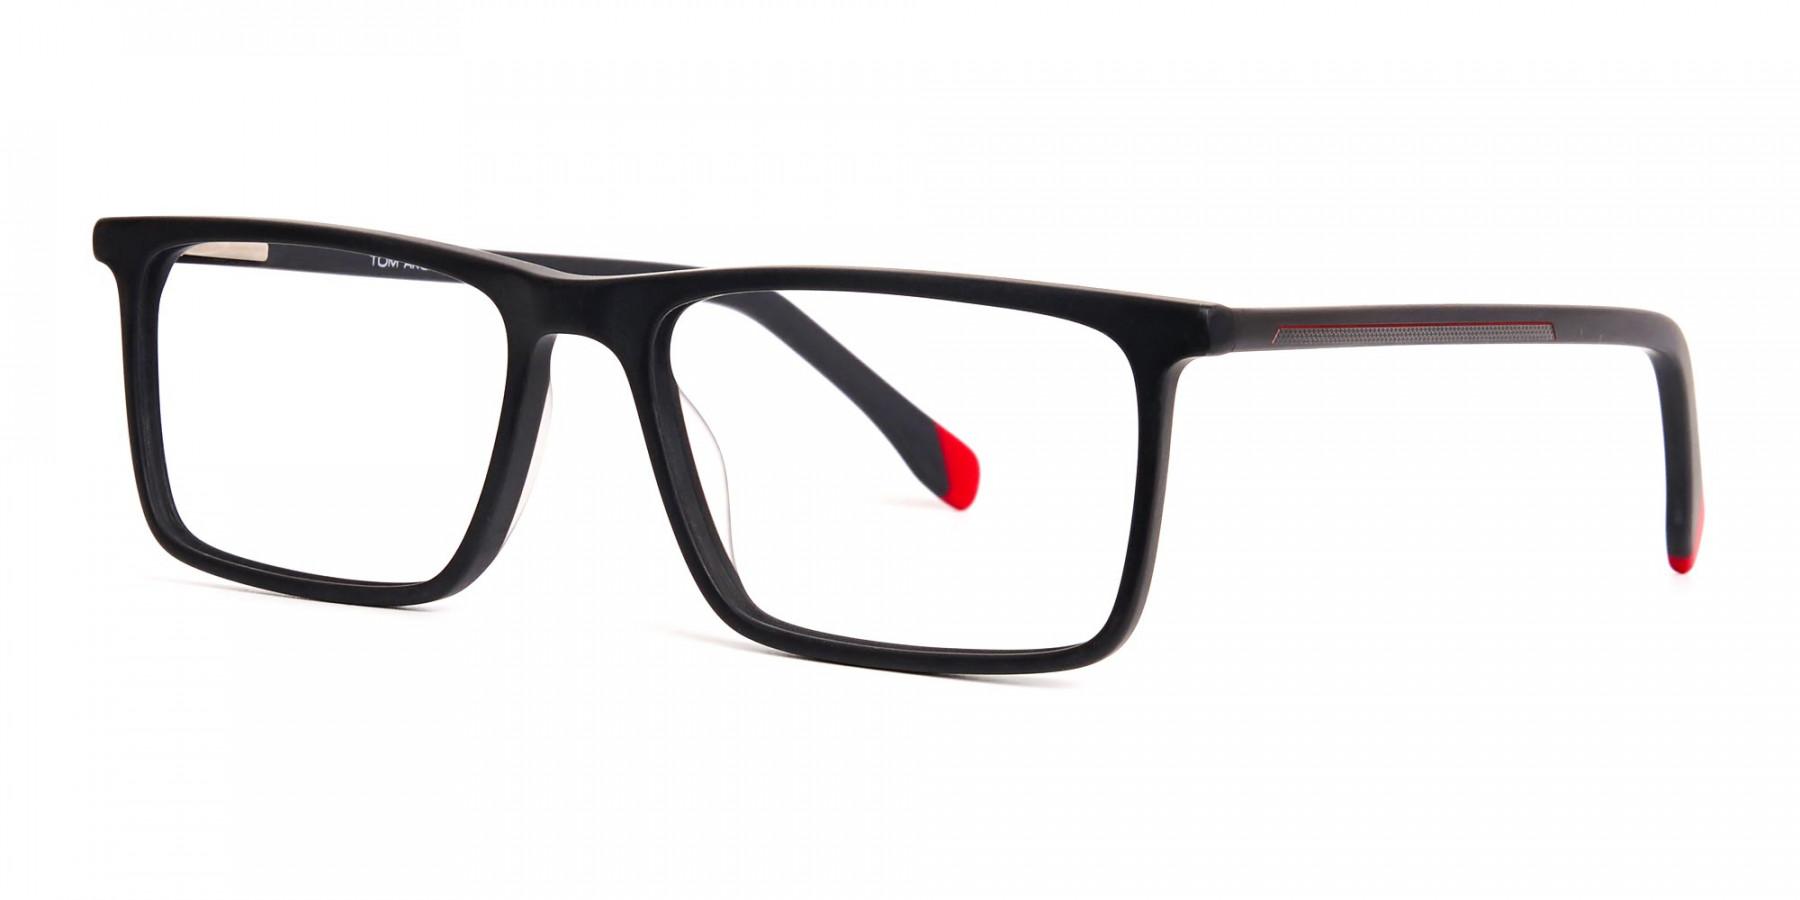 matte-grey-and-red-rectangular-glasses-frames-1